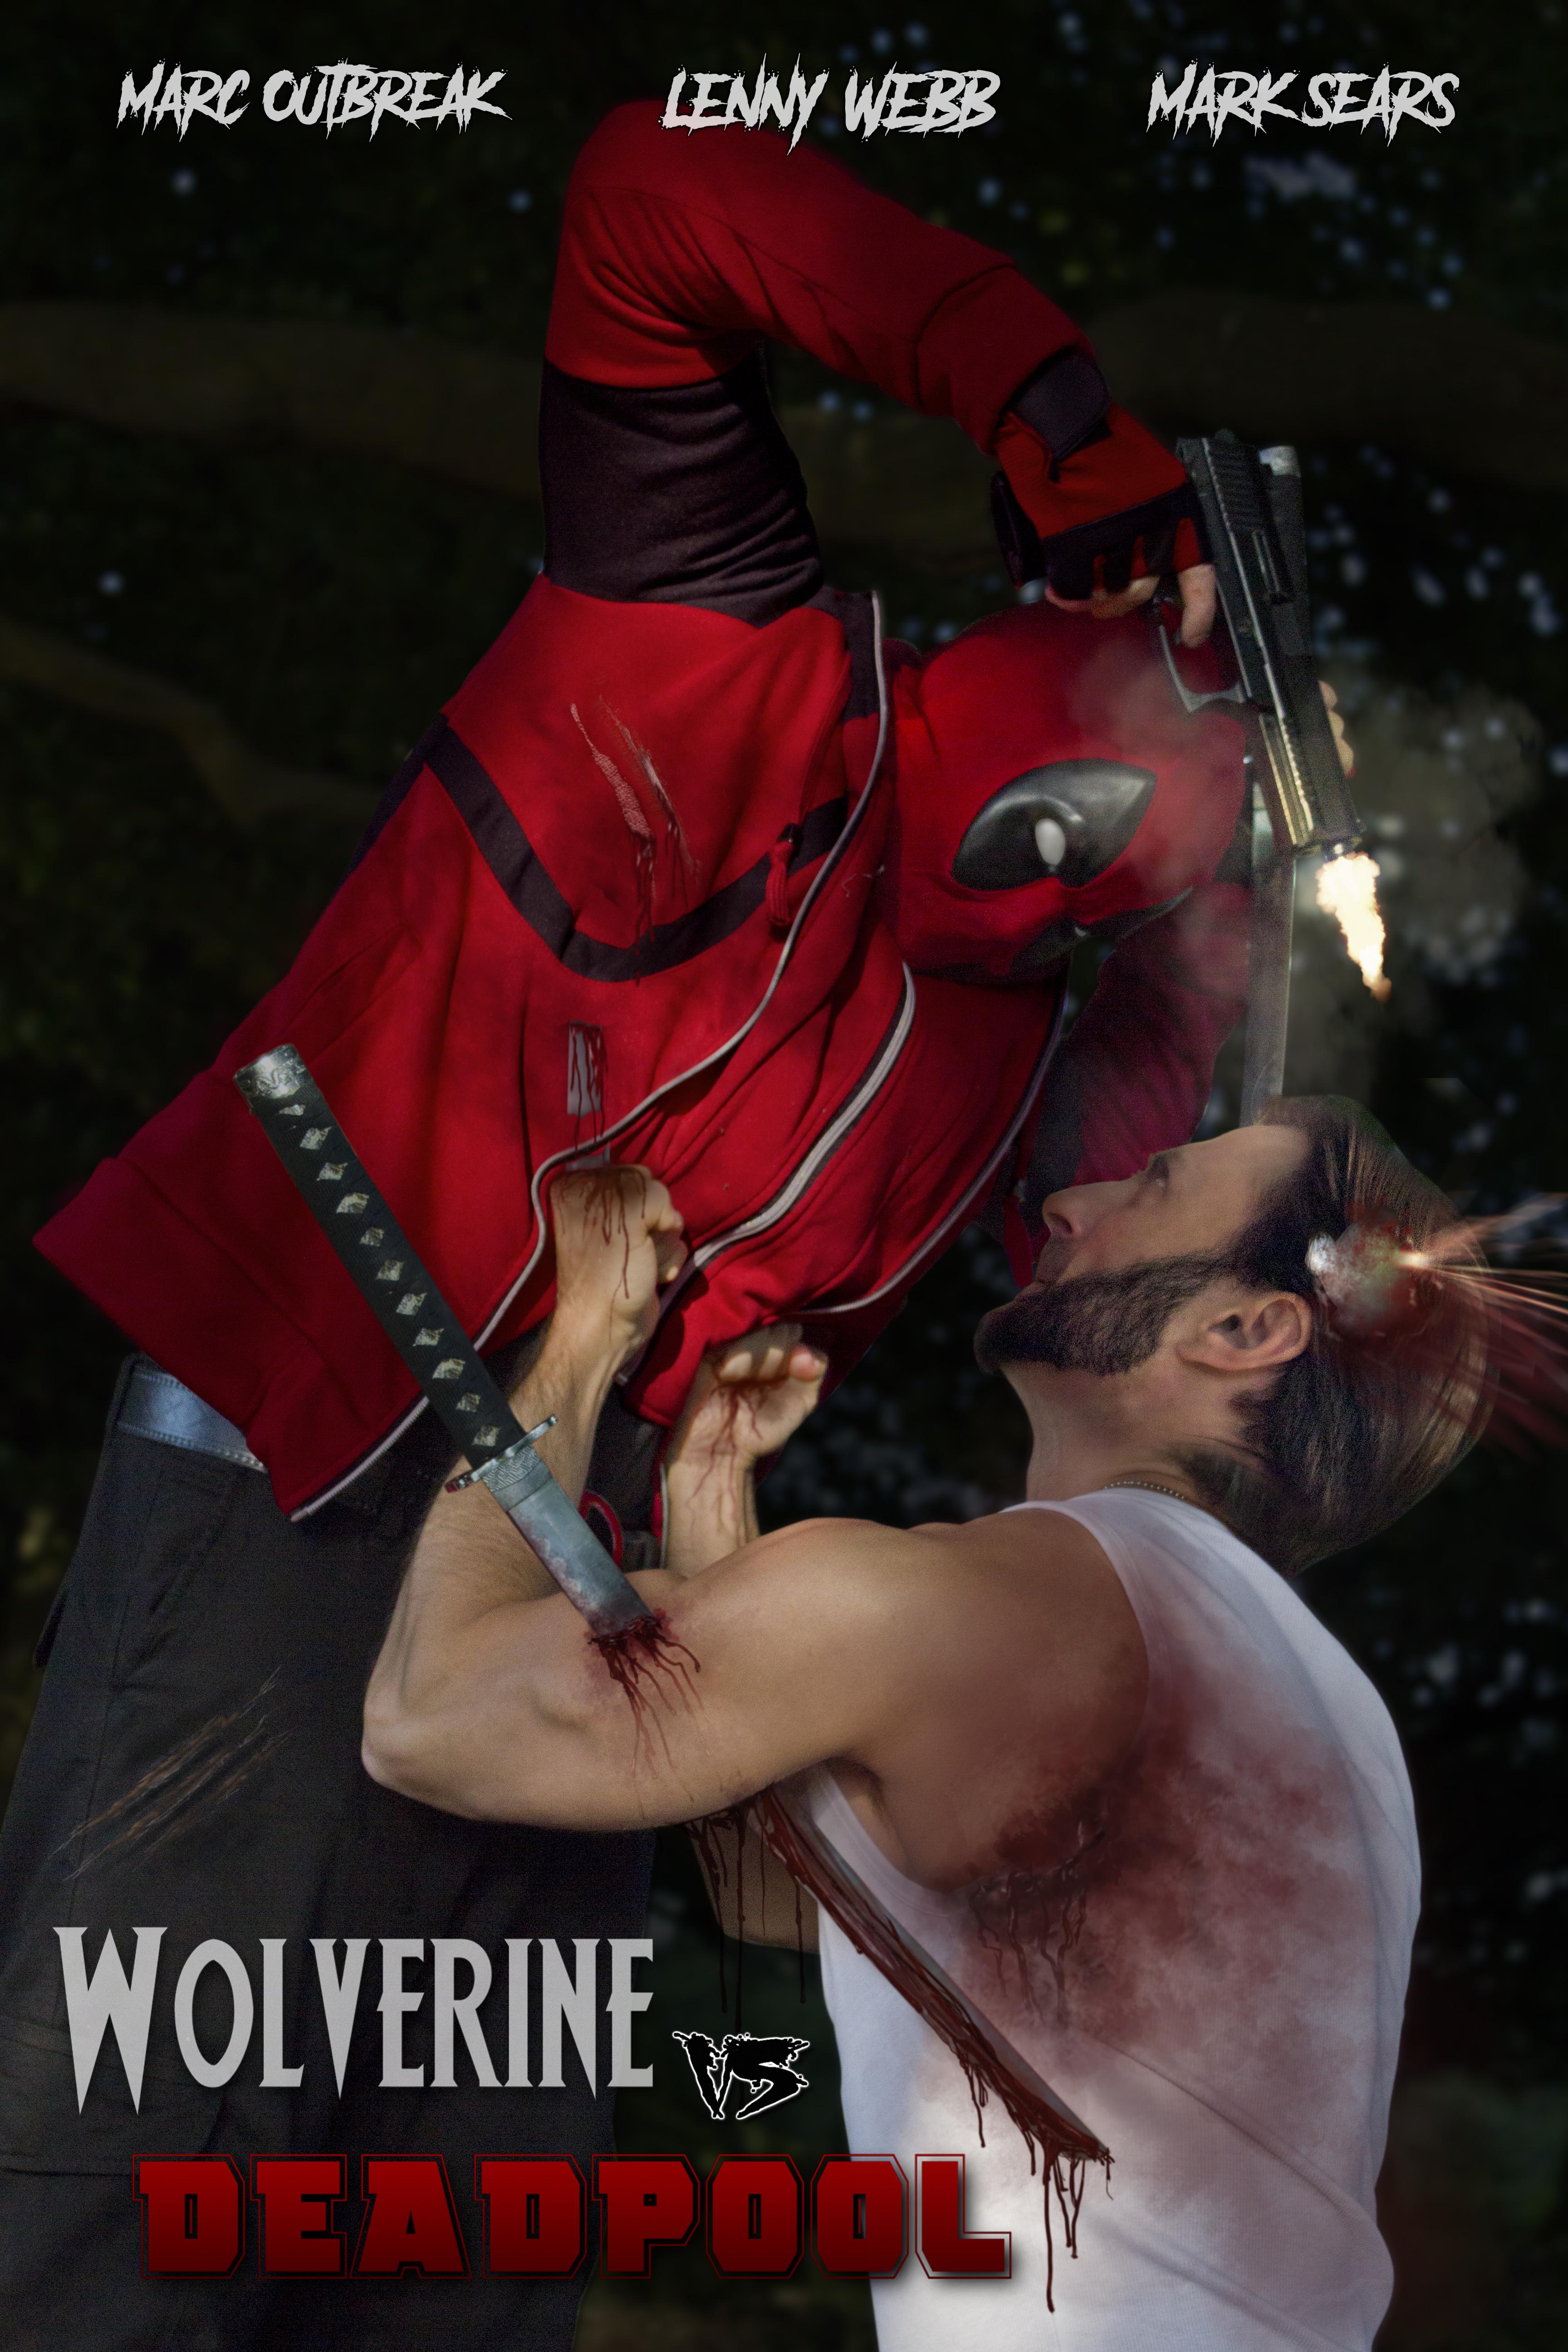 ee1c0f3cc3f Wolverine Vs. Deadpool: Back to Weapon X (2019) - IMDb